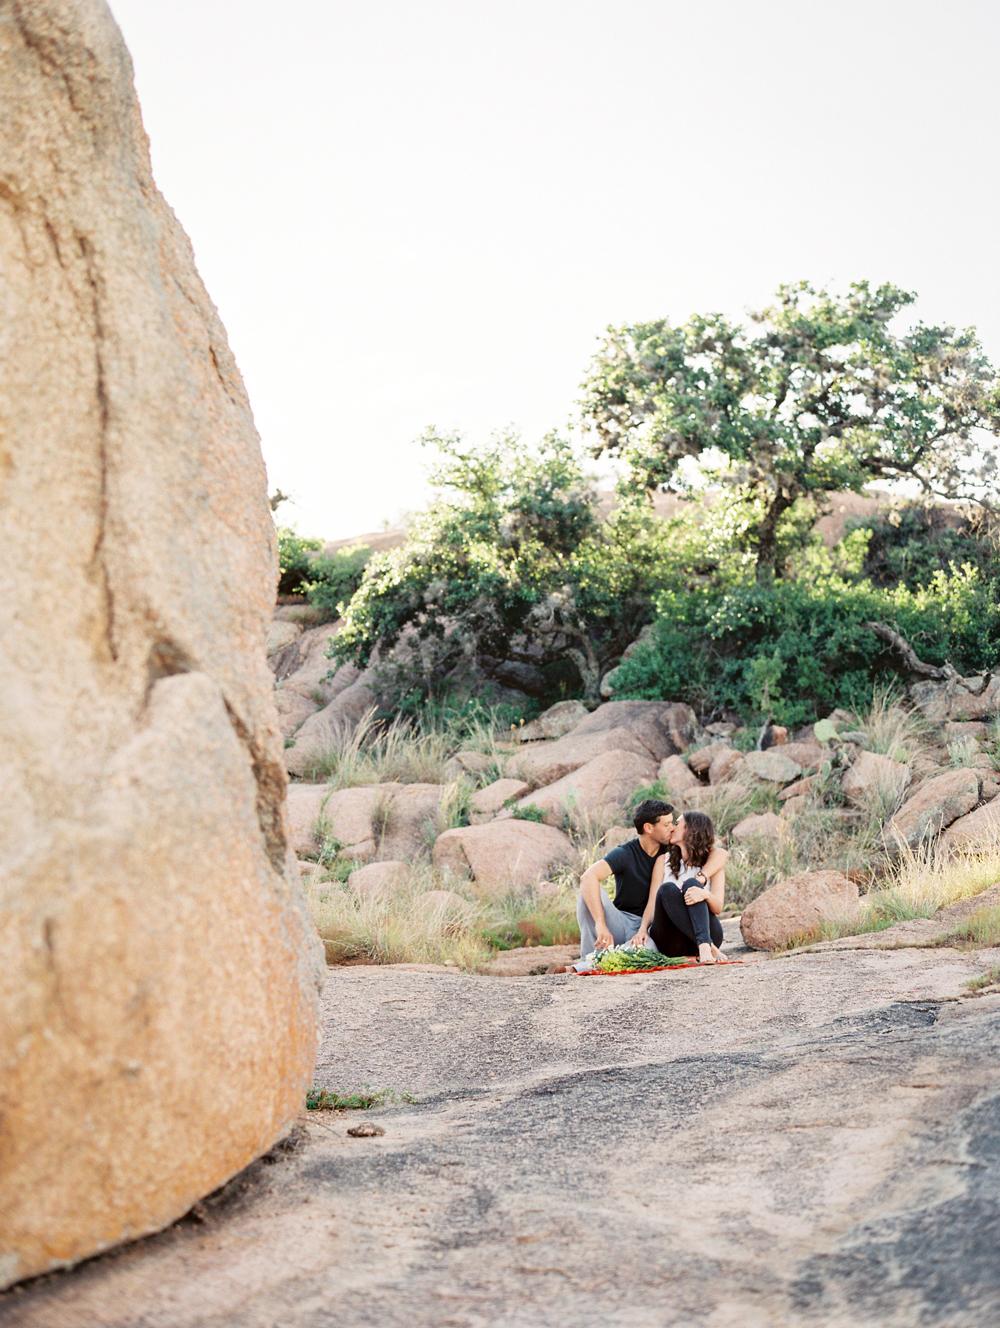 dana fernandez photography enchanted rock engagements photographer austin wedding destination film-1.jpg